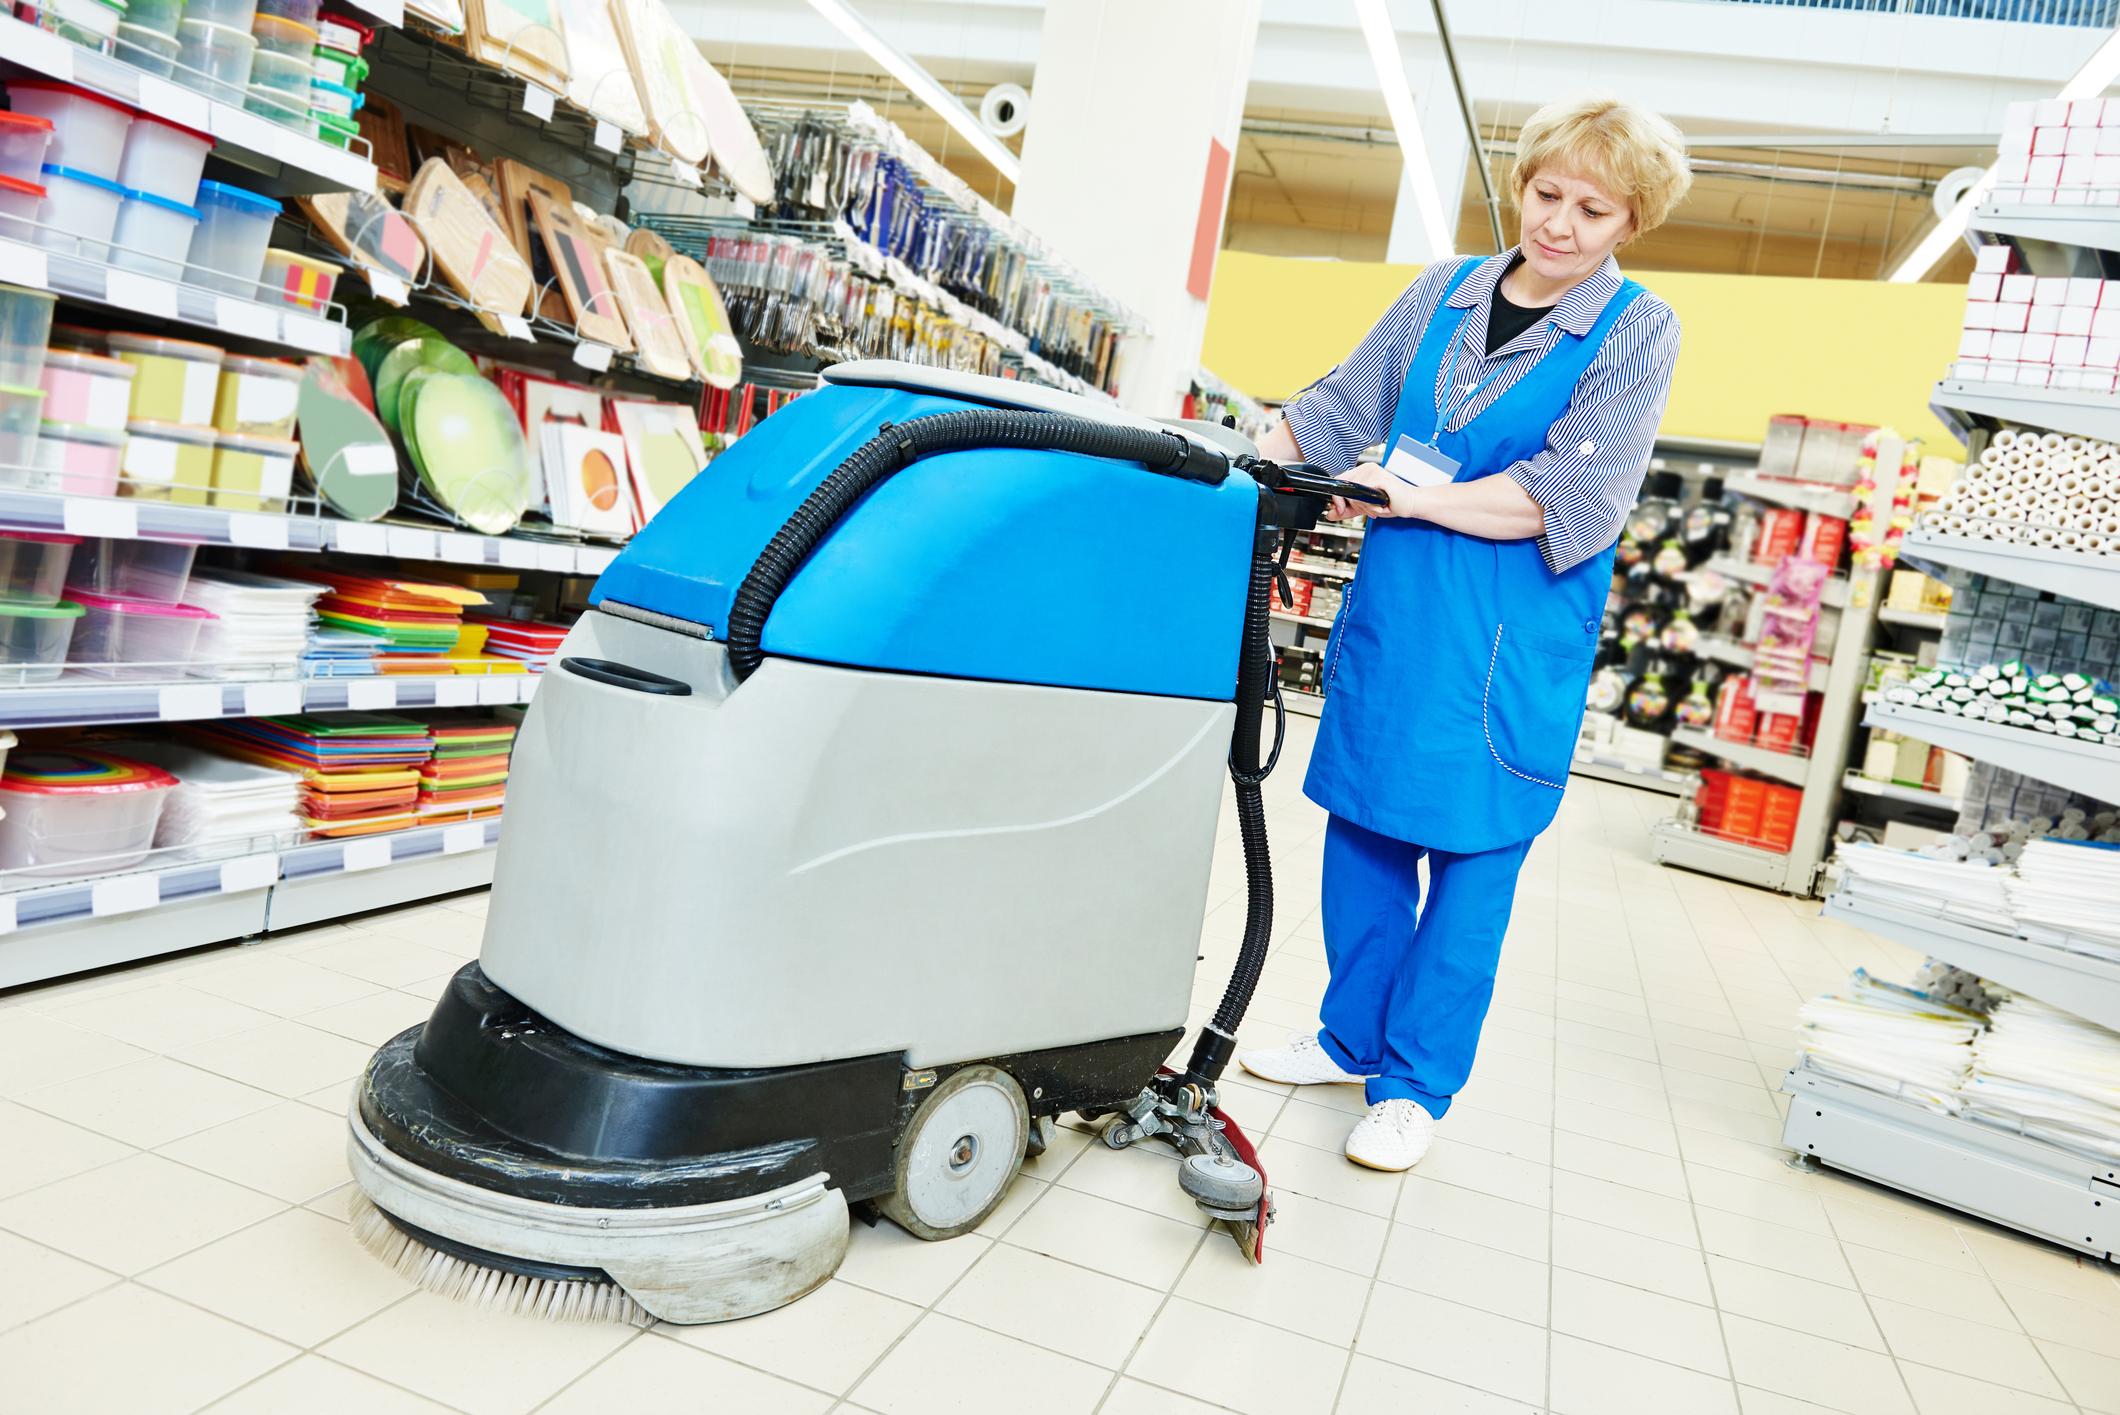 An retailer employee using a walk-behind scrubber to clean a floor.